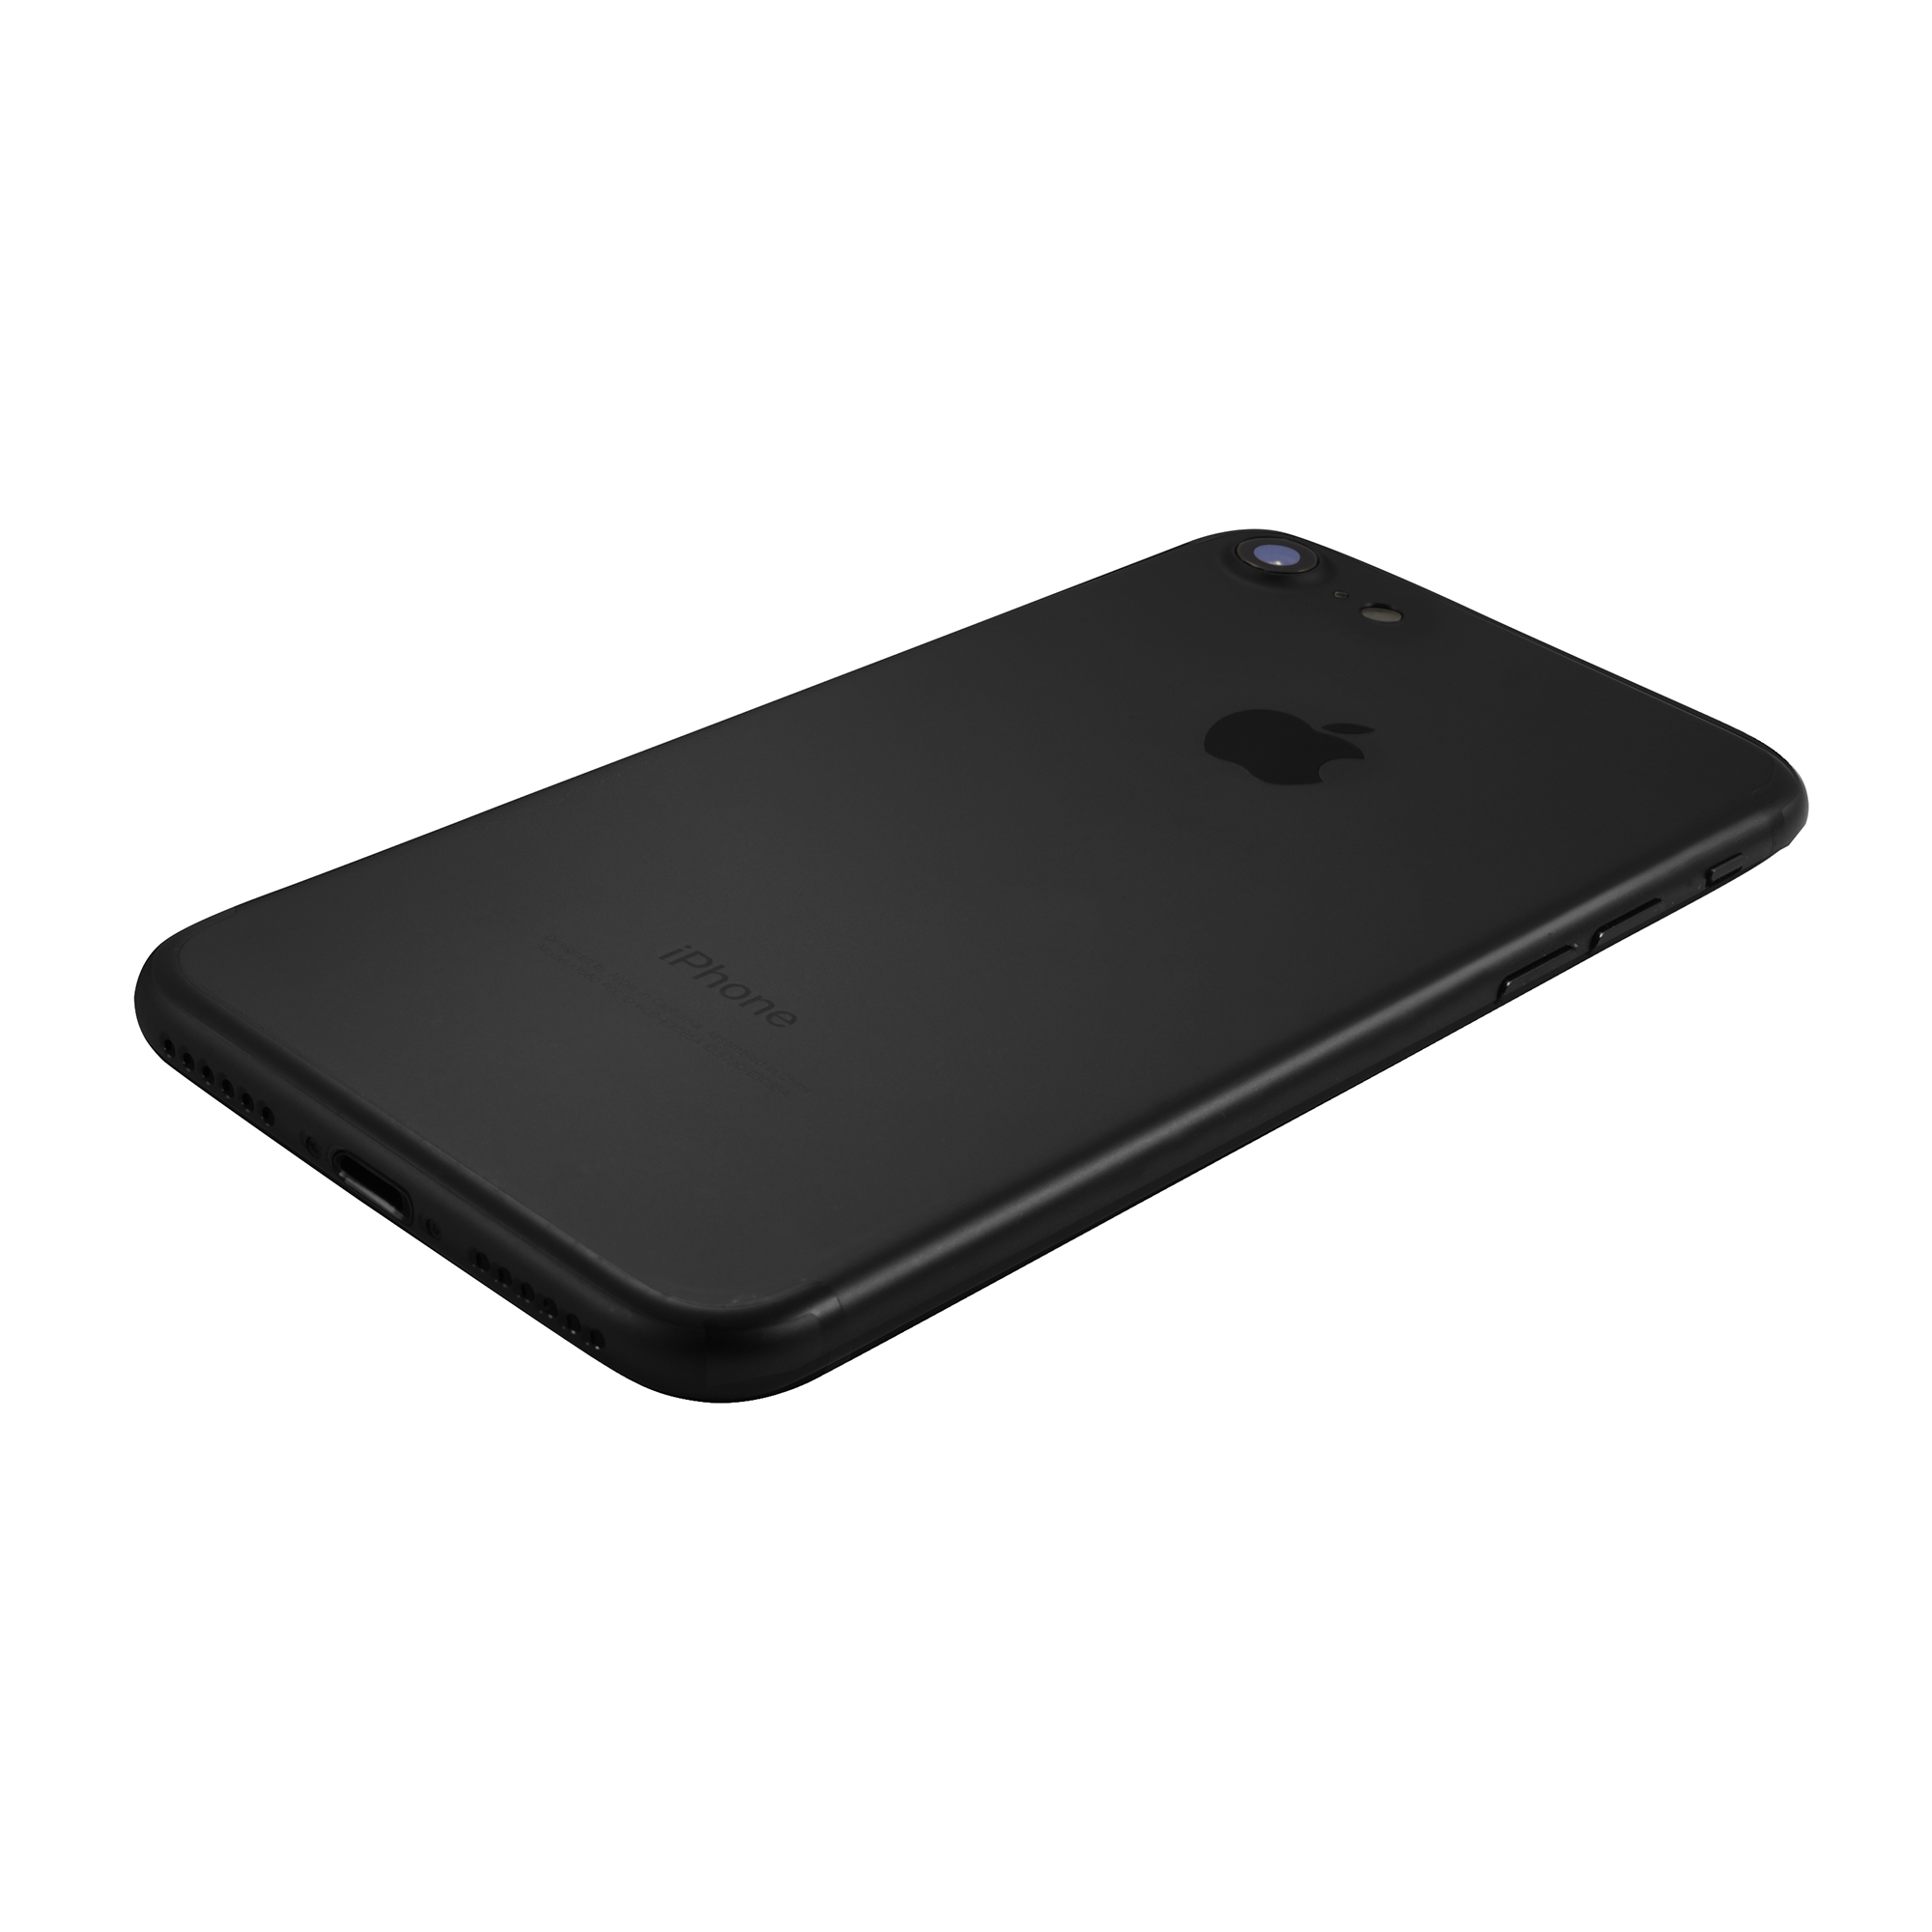 Apple-iPhone-7-a1778-128GB-GSM-Unlocked-Very-Good